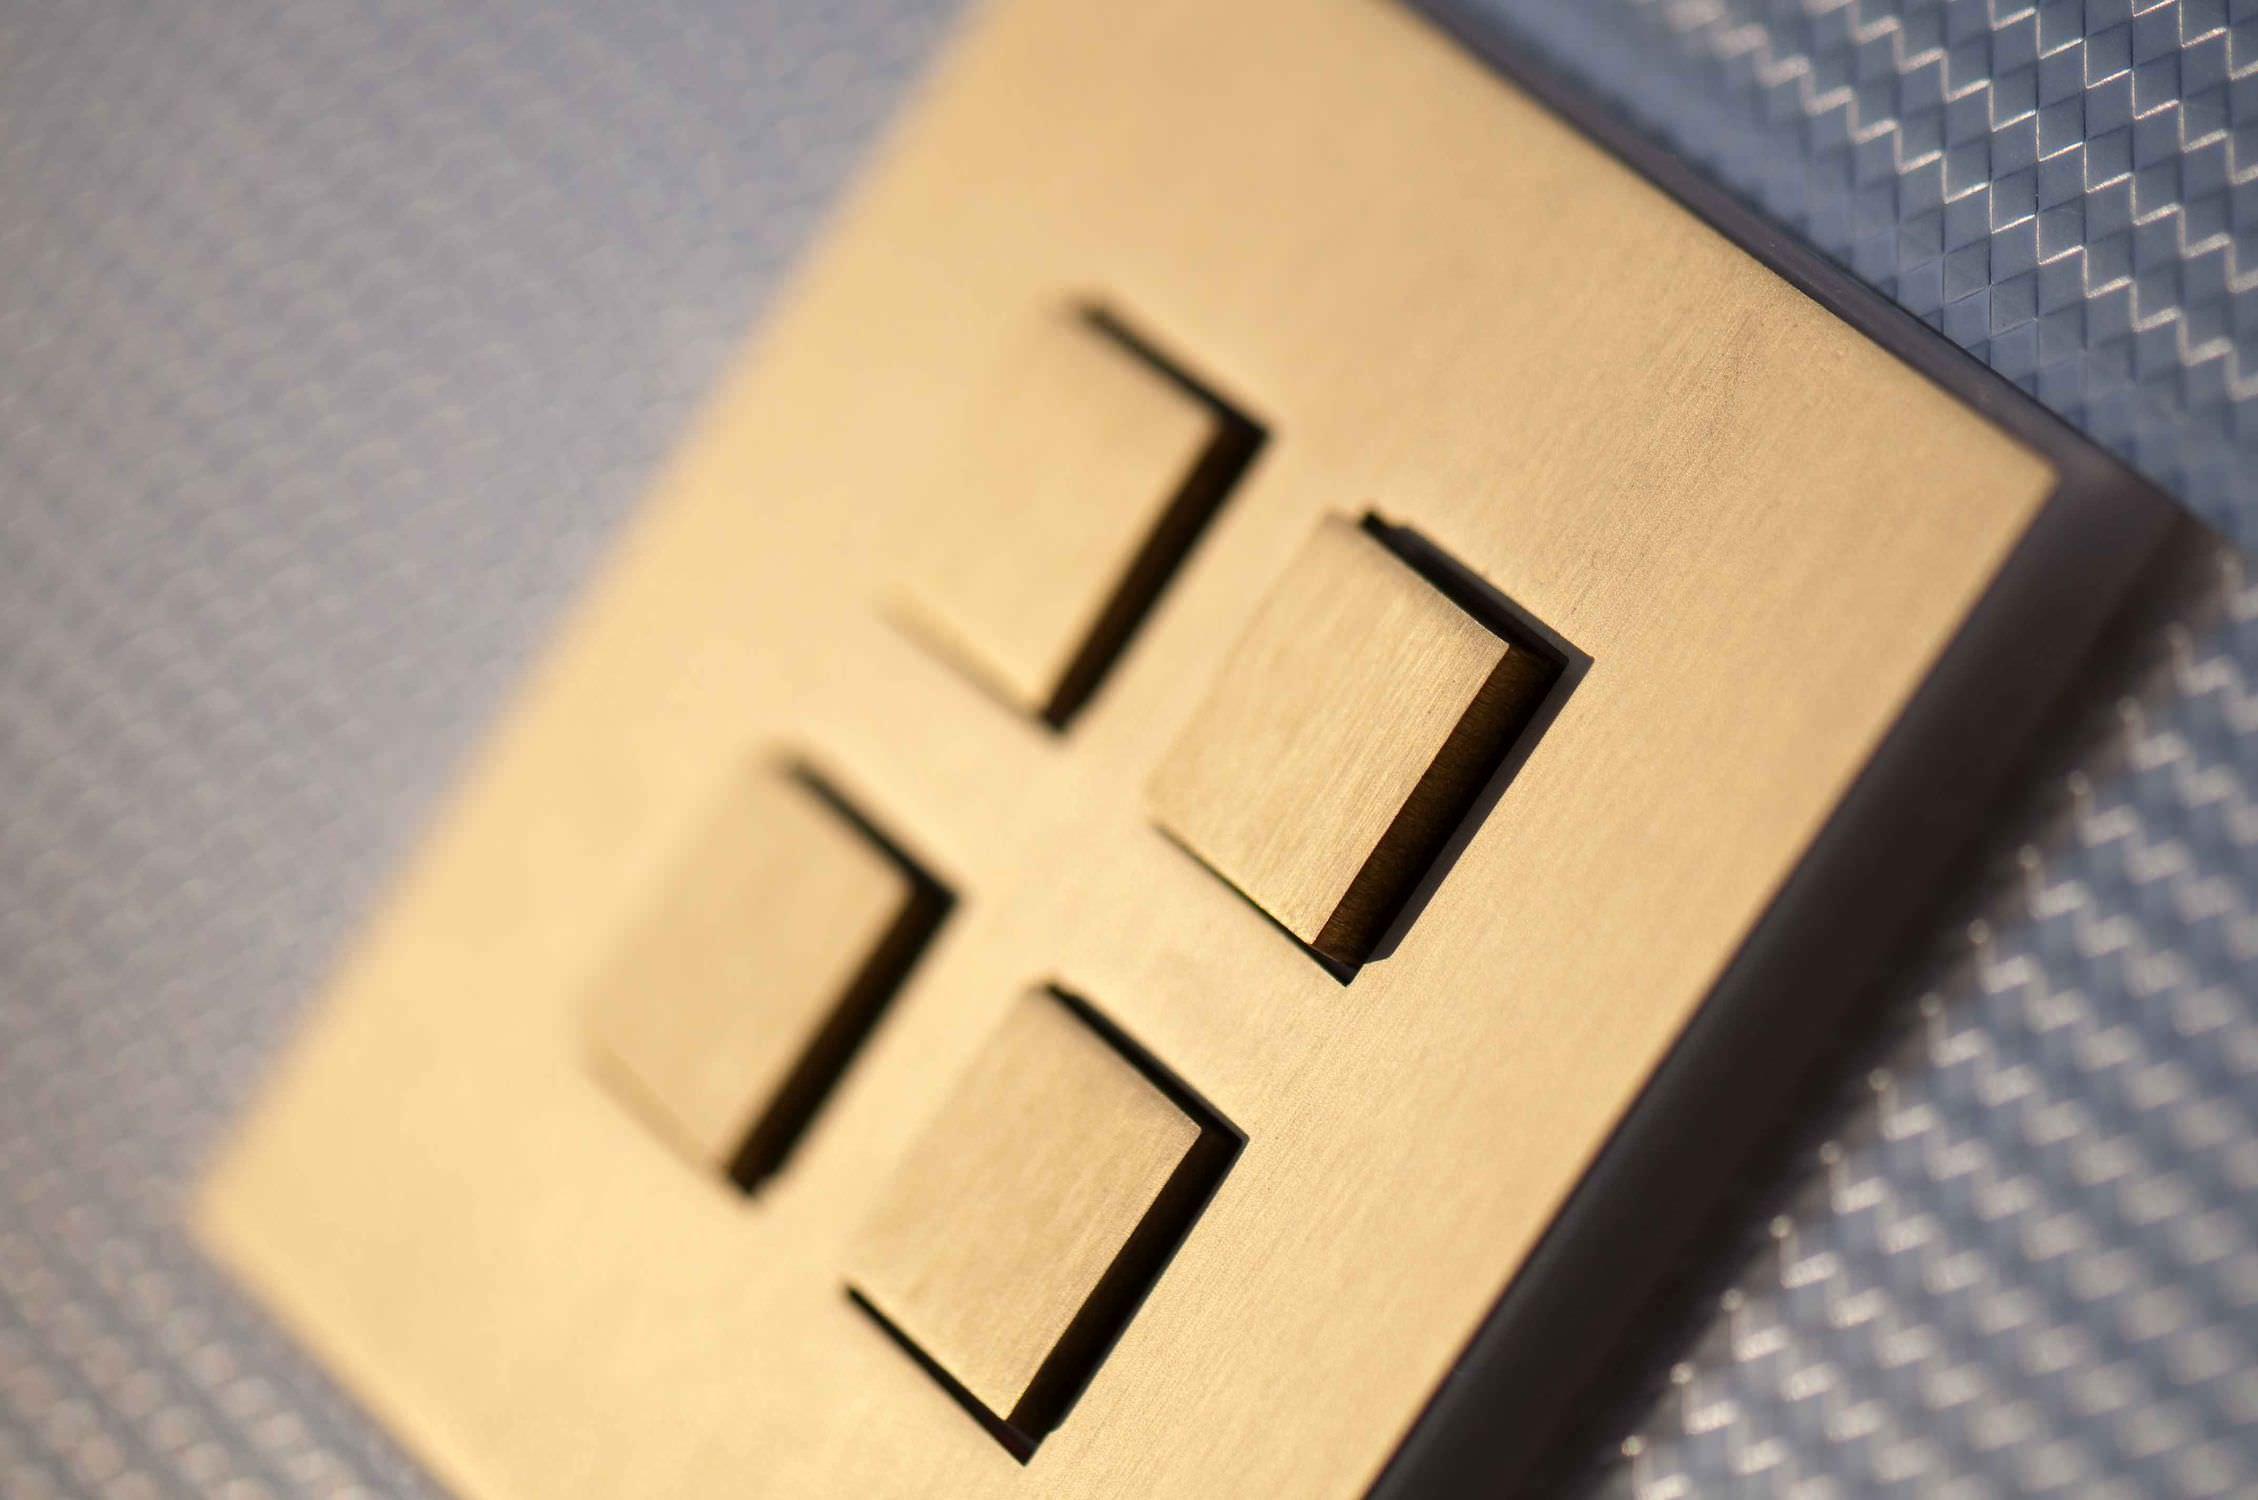 light-switch-push-button-quadruple-stainless-steel-49562-2104569.jpg